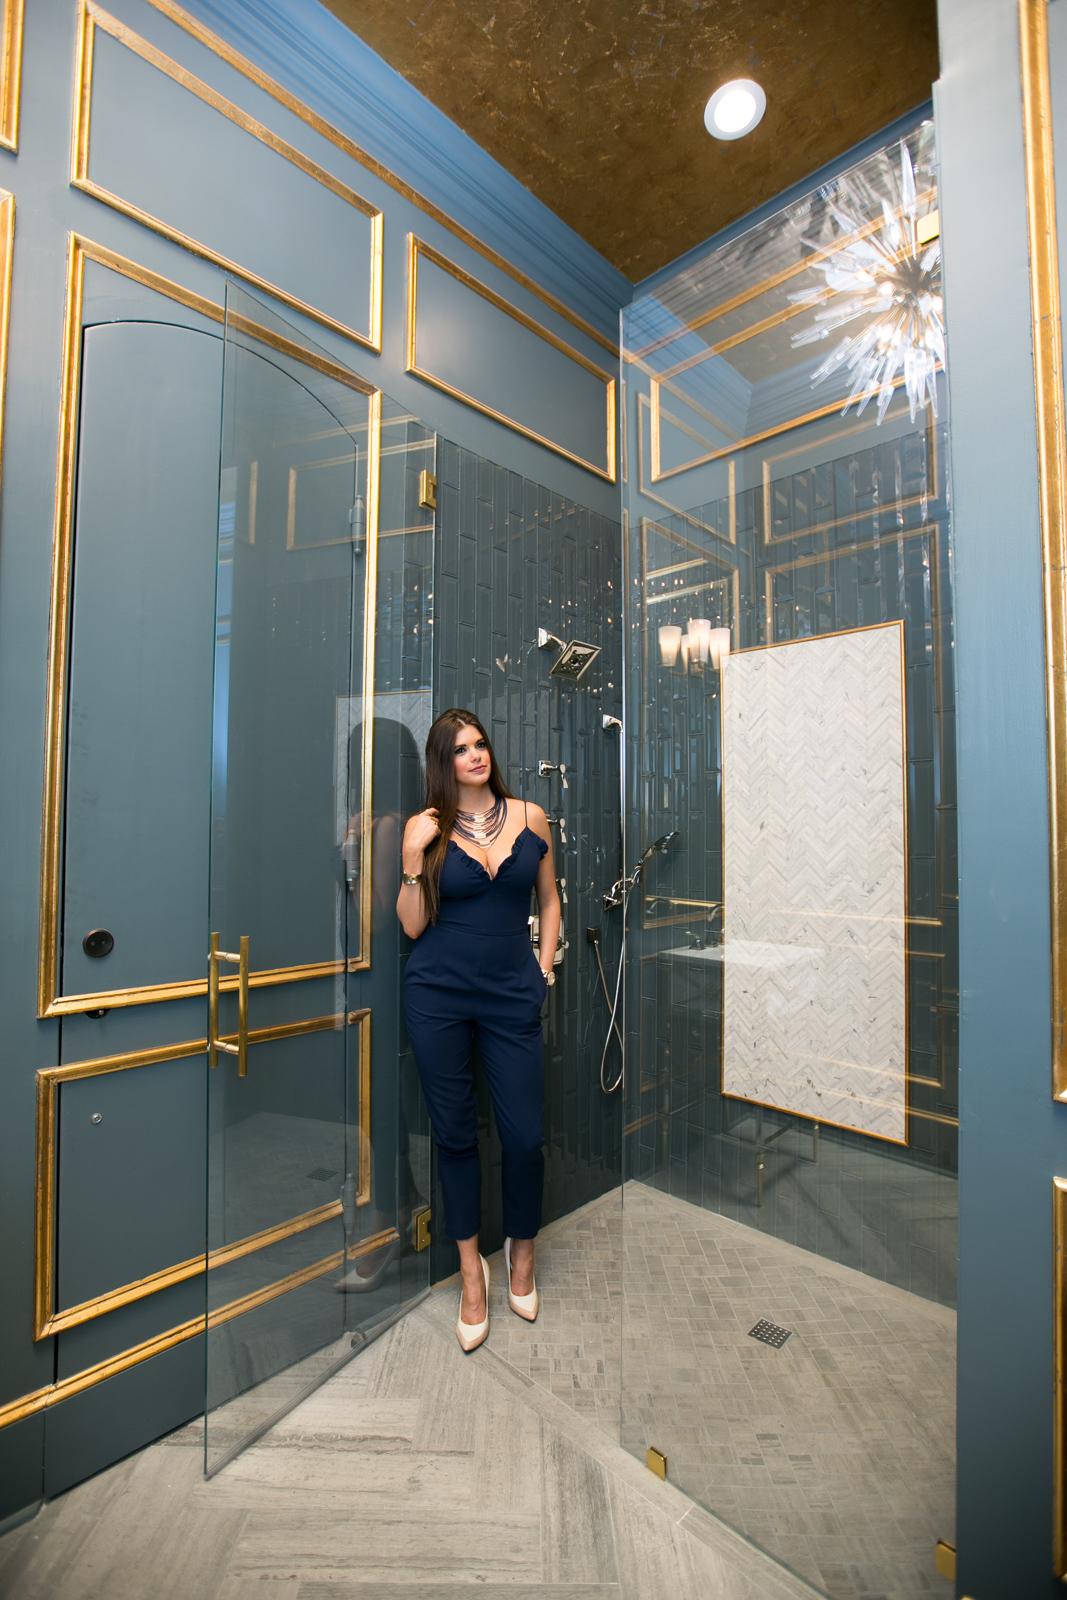 Powder bathroom designed by JL Studio Designs